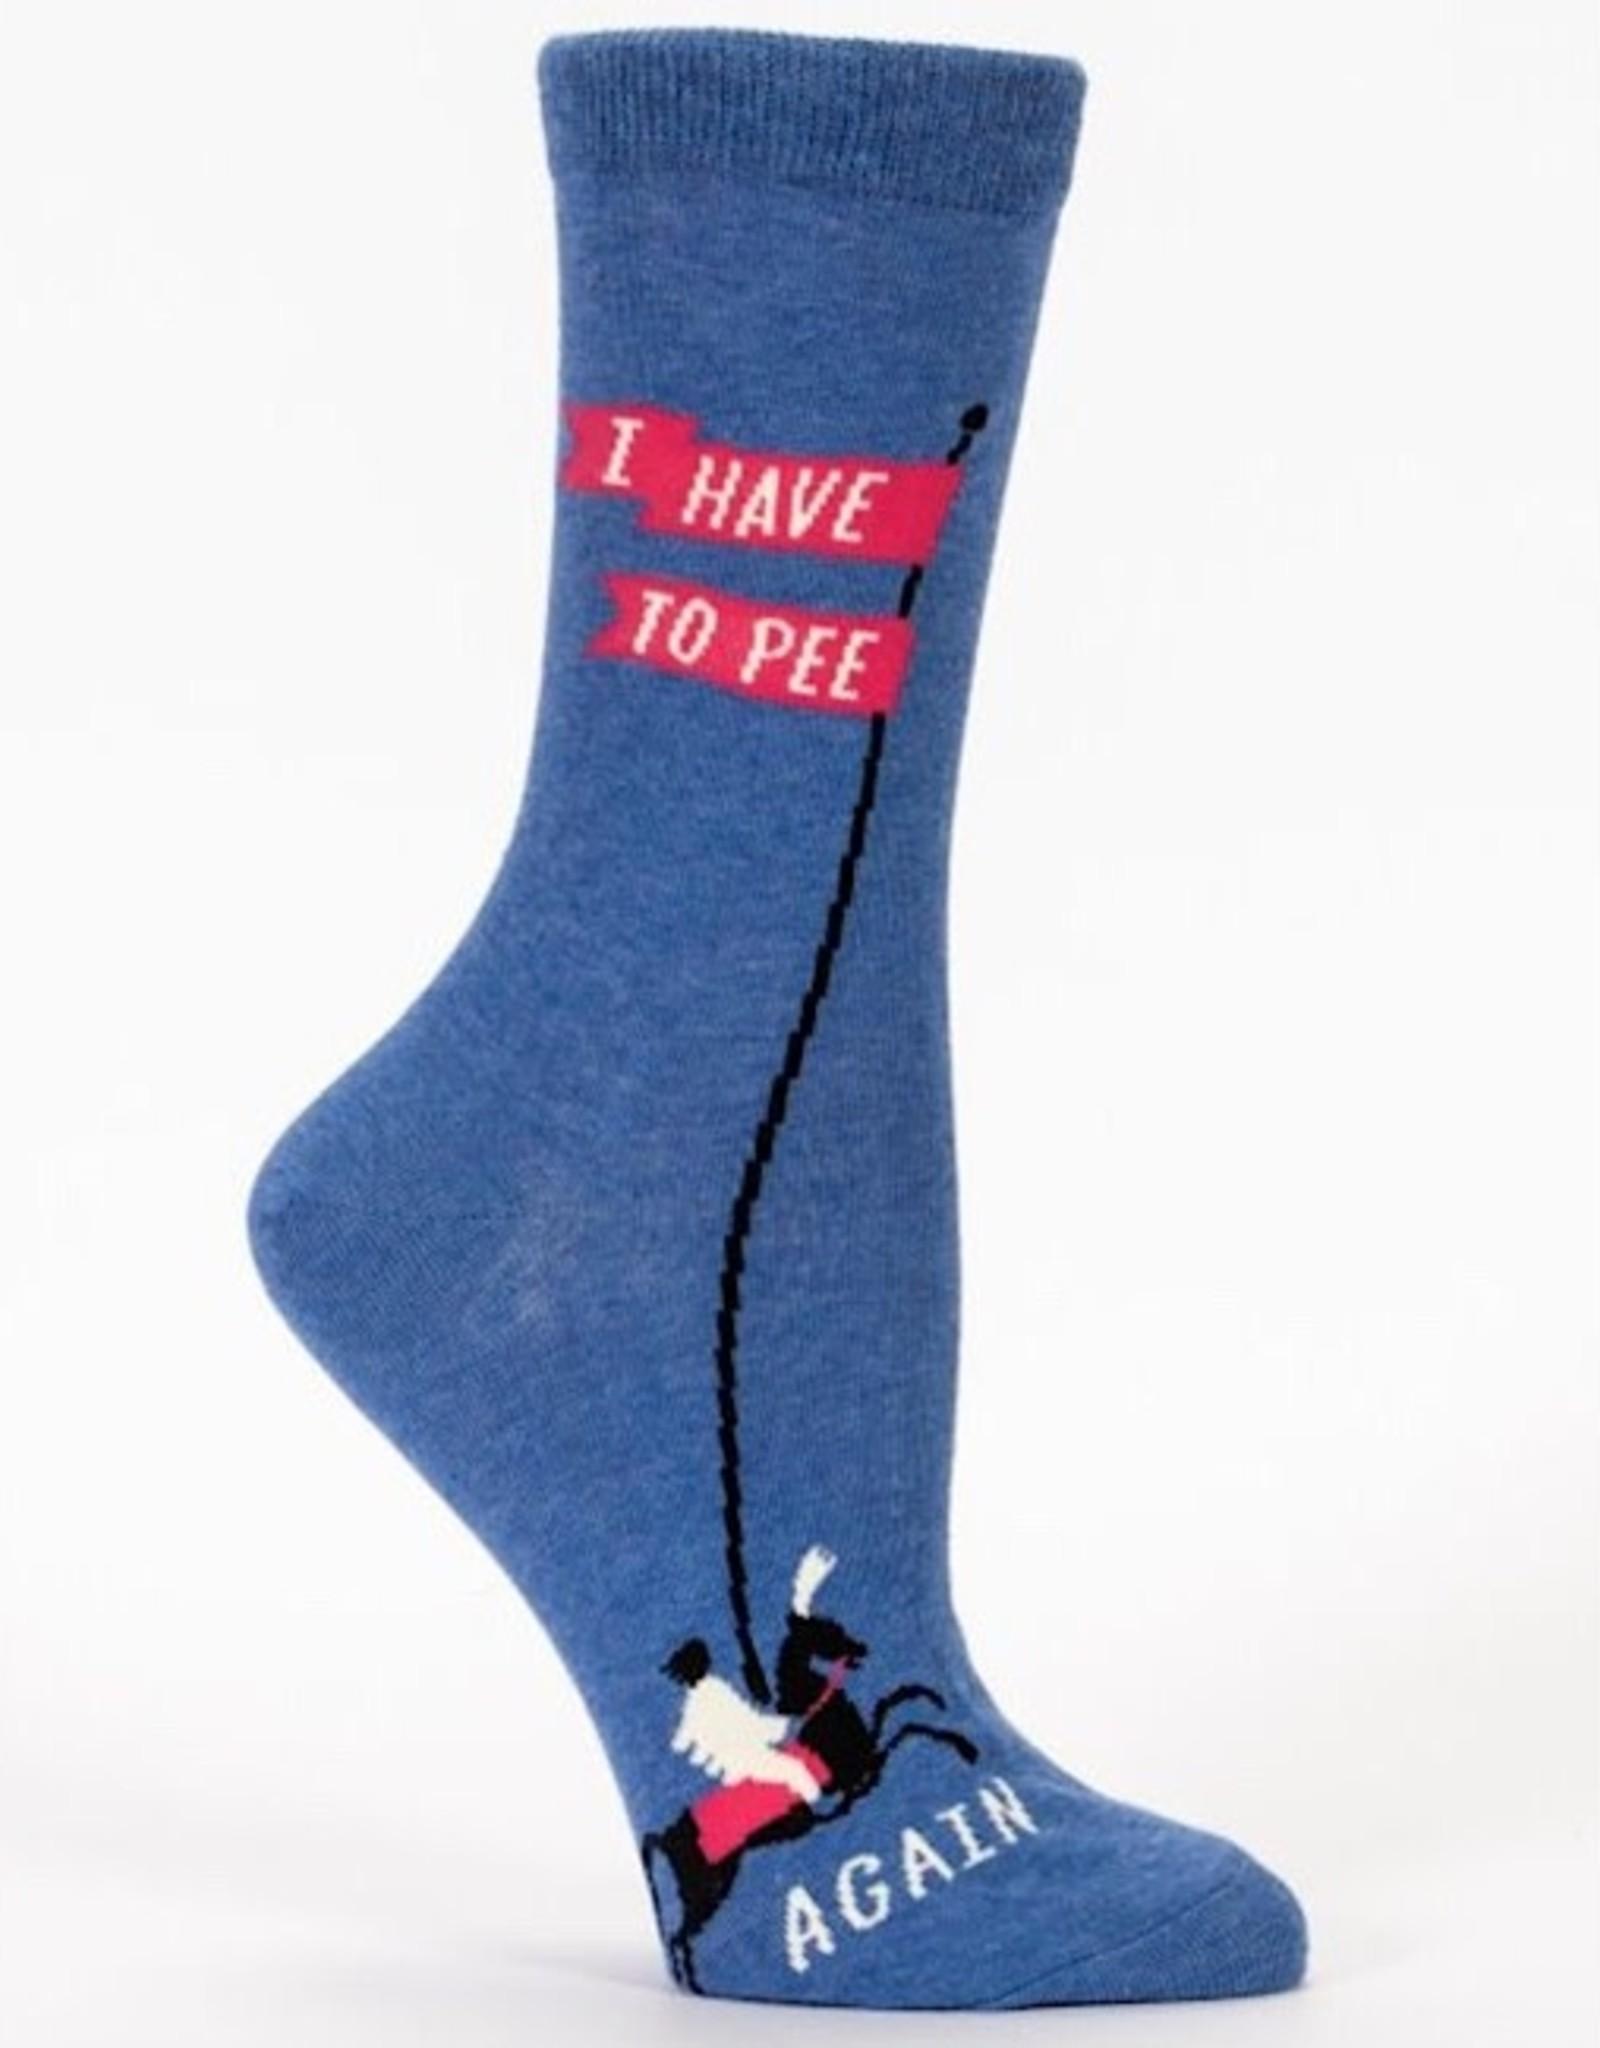 Socks (Womens) - I Have To Pee Again